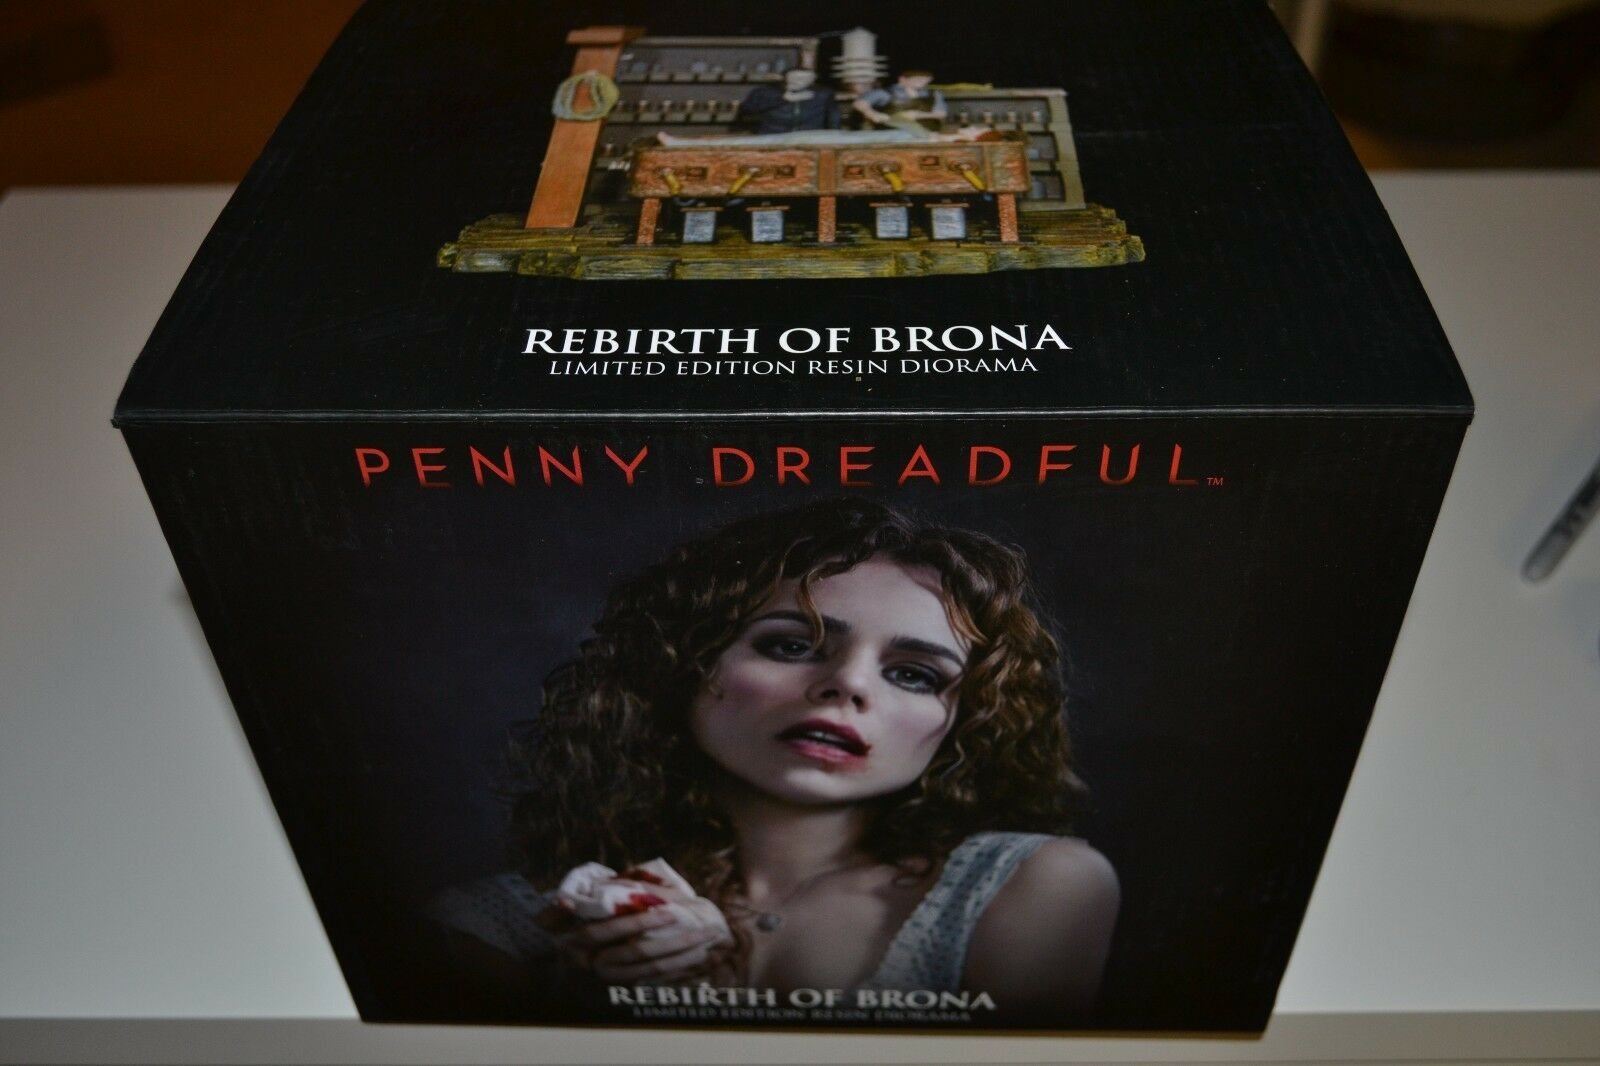 NEW RARE USAopoly Penny Dreadful Dreadful Dreadful Rebirth Of Brona Diorama Gothic COA 388 500 be3aec